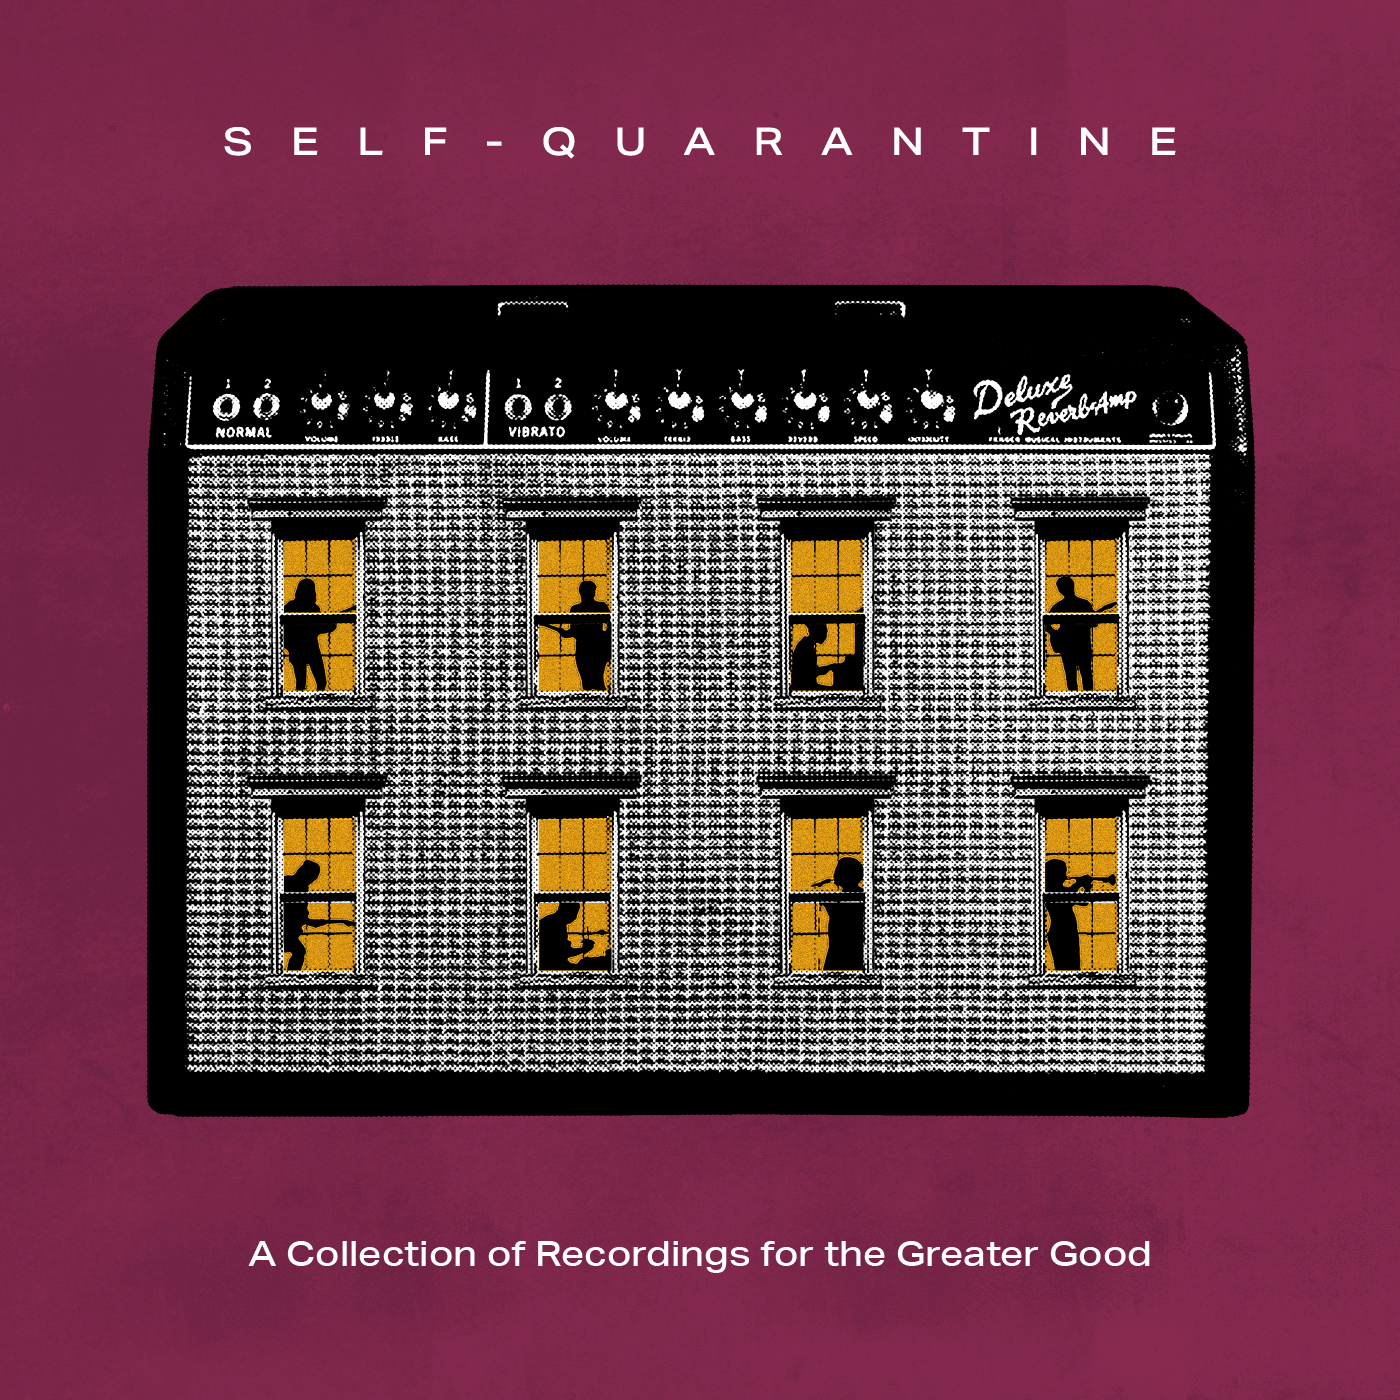 self_quarantine_1400x1400px (1)